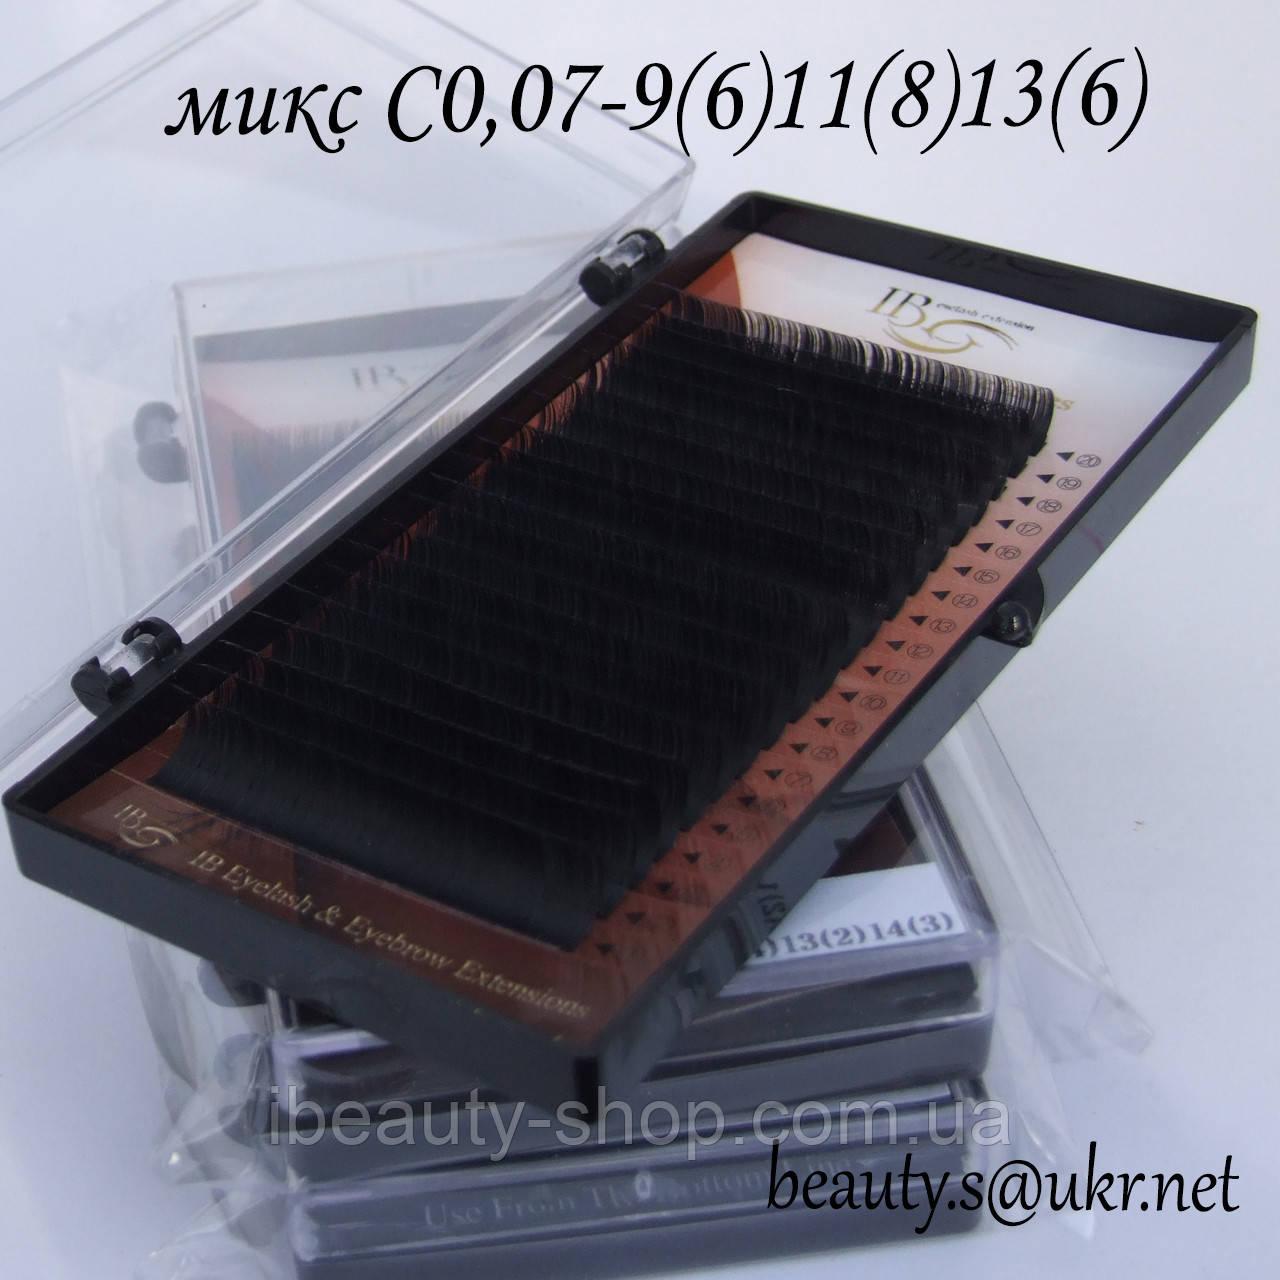 Ресницы I-Beauty микс С-0,07 9-11-13мм